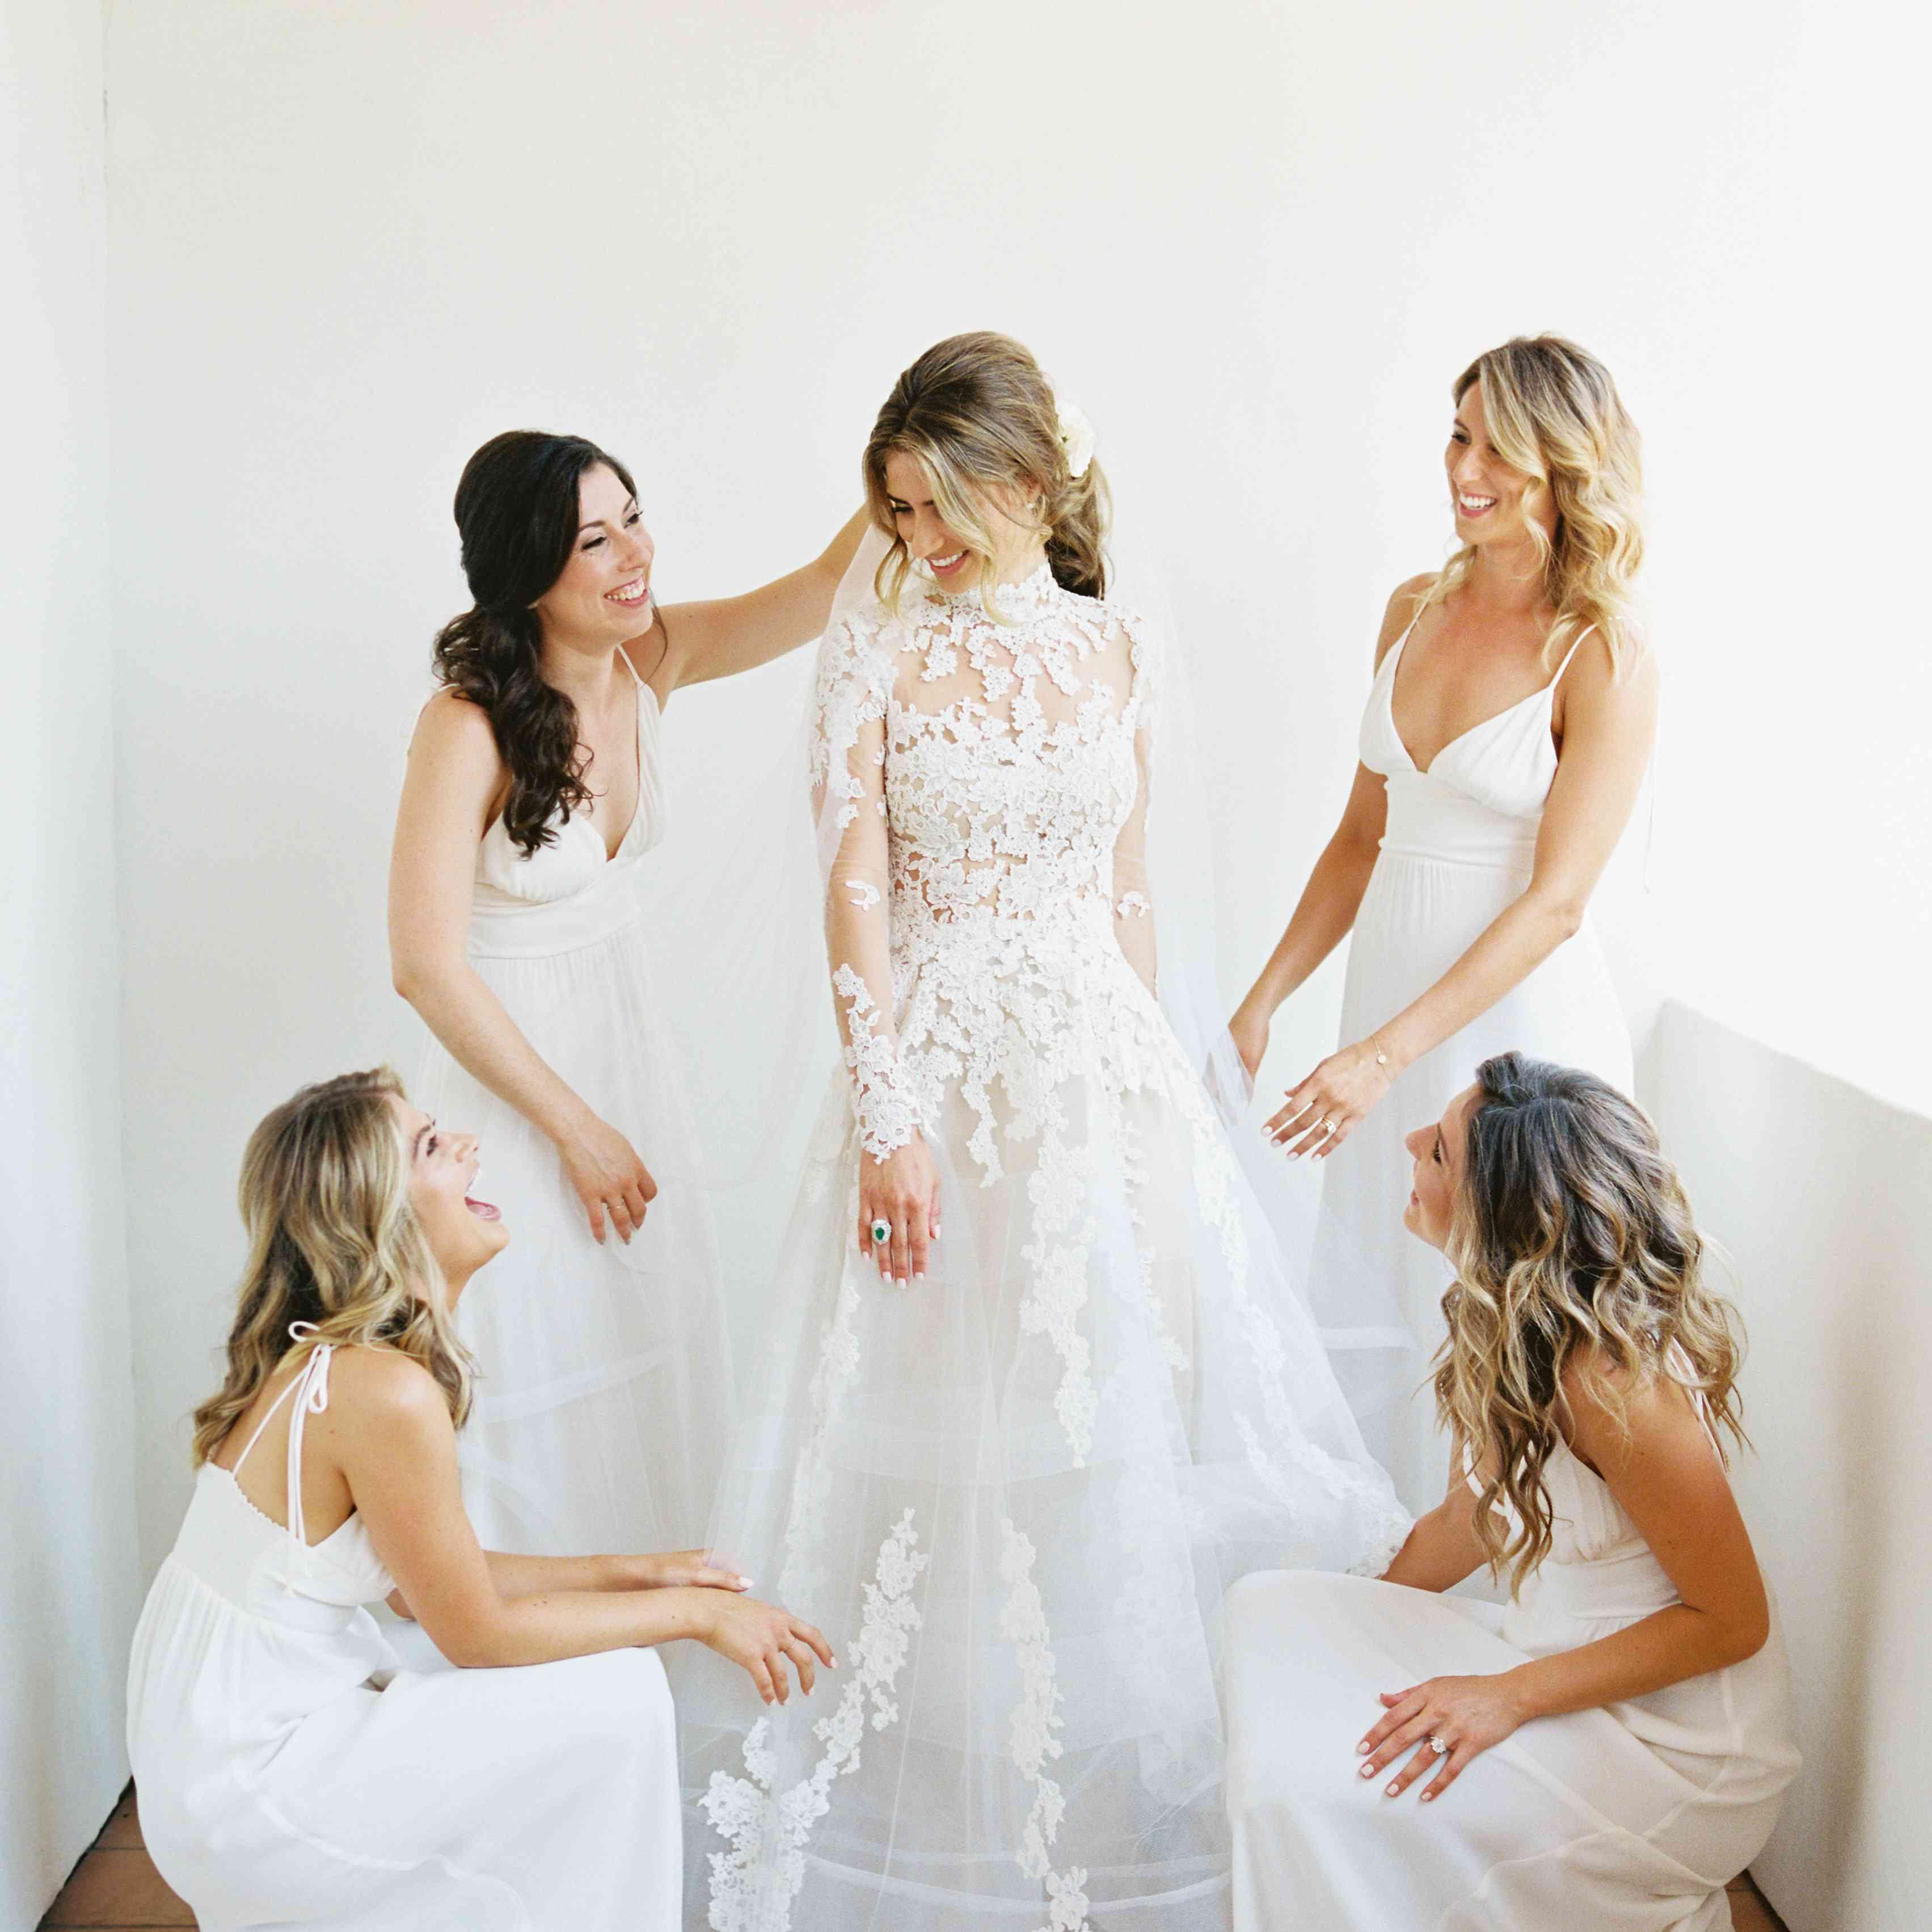 bride with bridesmaids white dresses